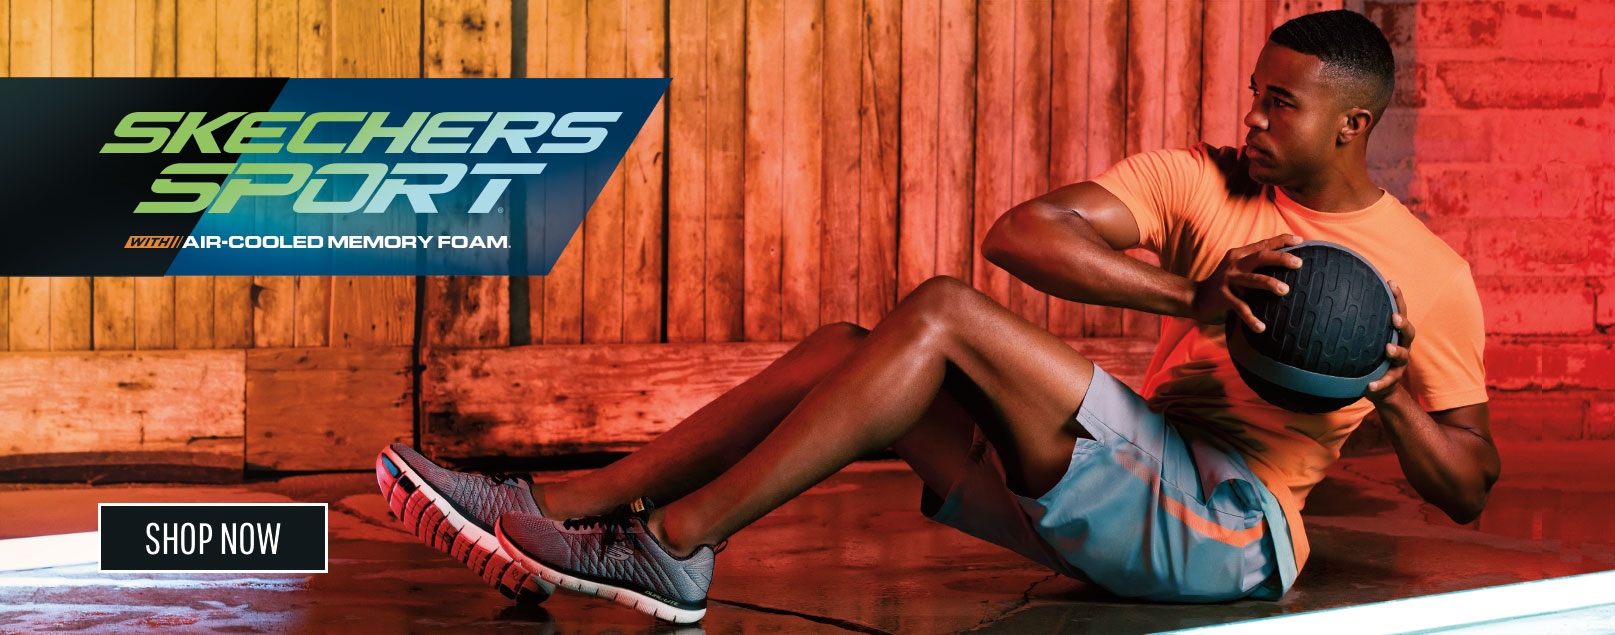 Find Men's SKECHERS Athletic Sport shoes on skechers.com